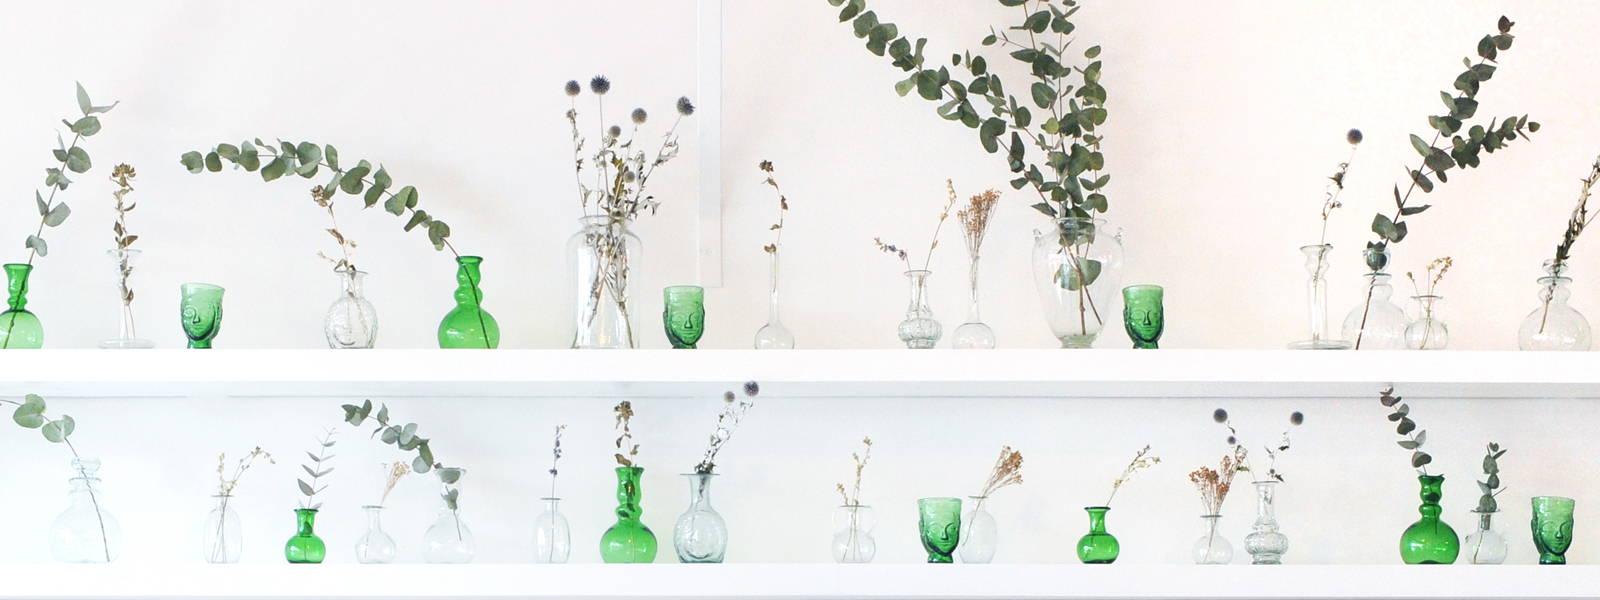 La Soufflerie Vase Display